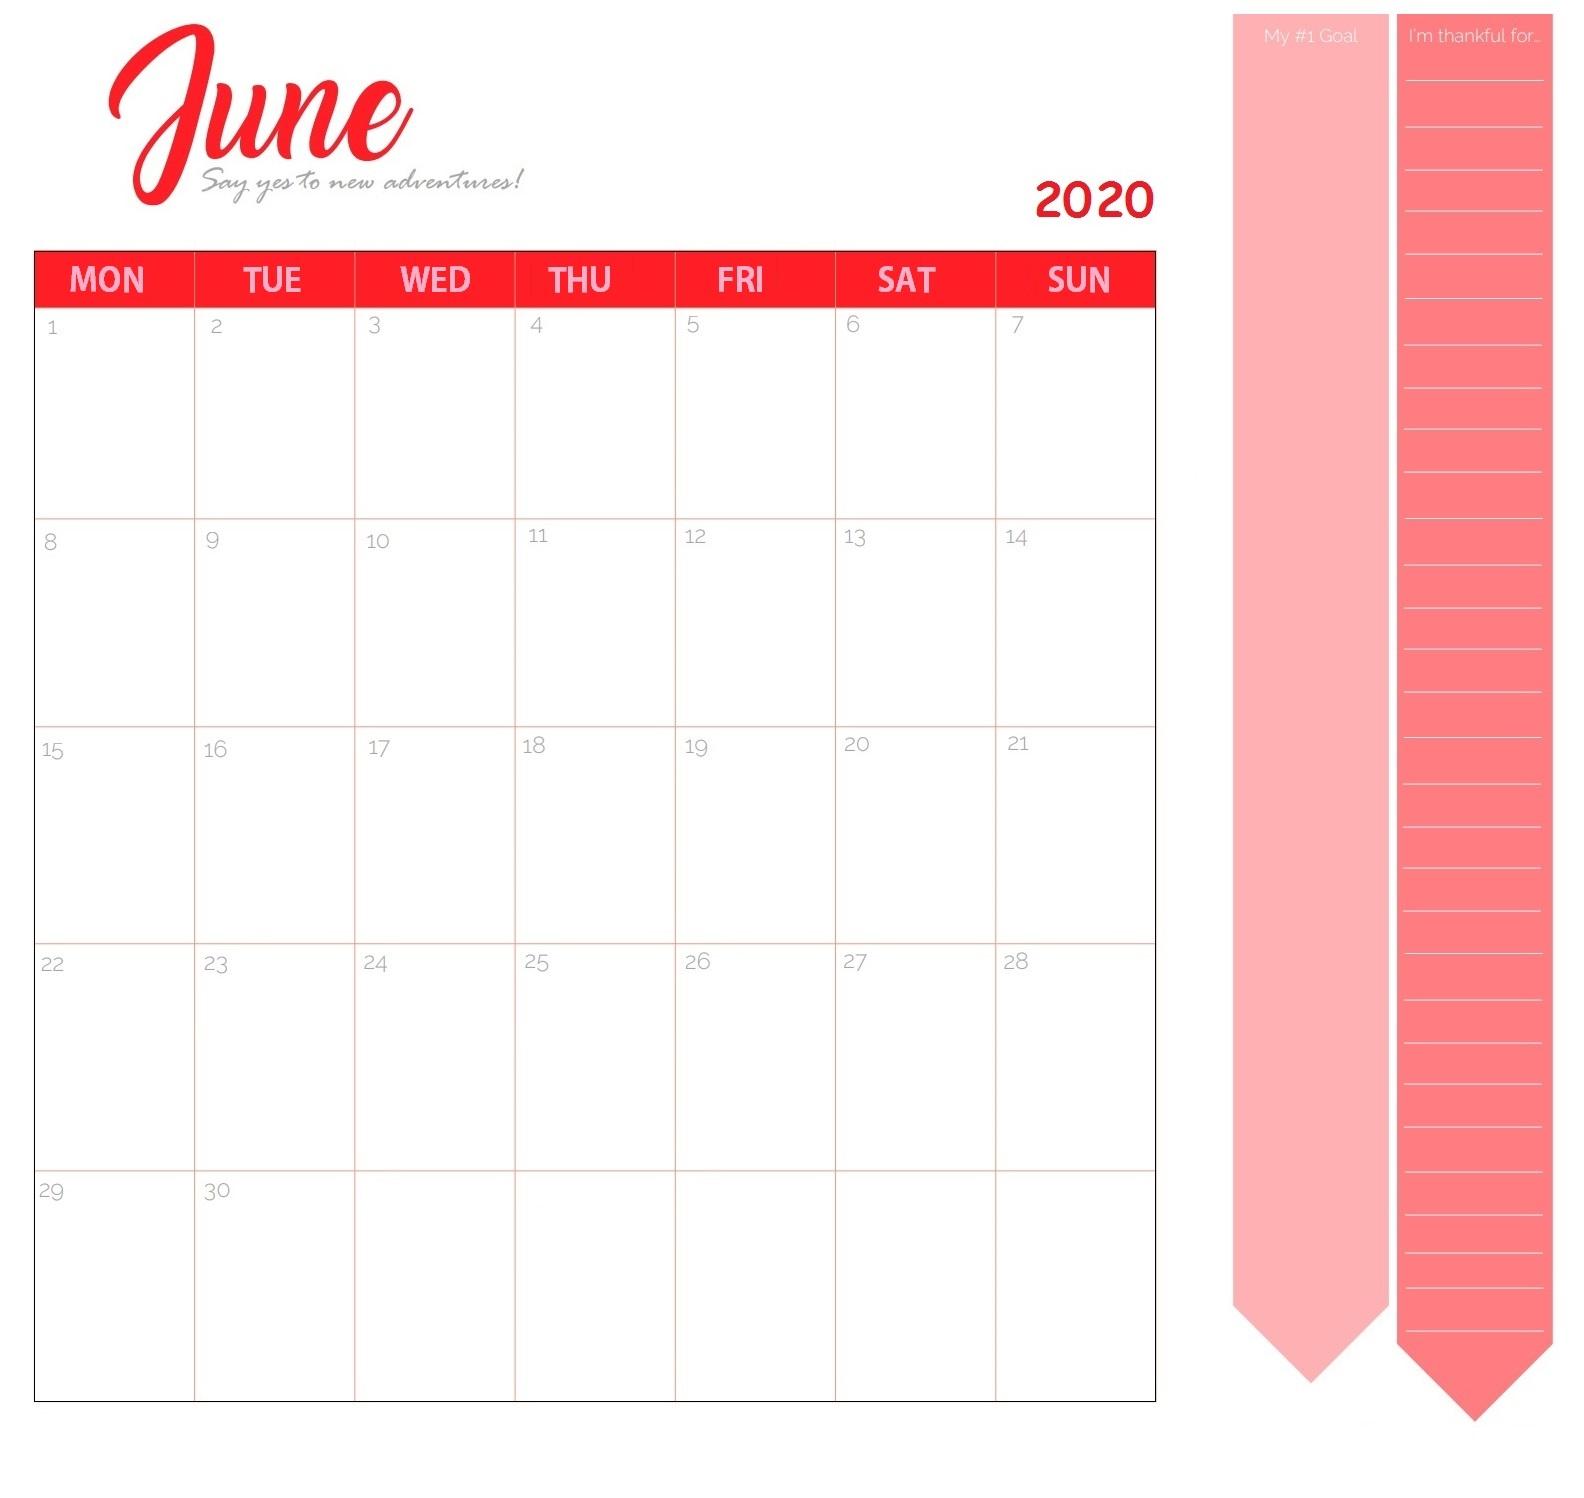 Cute June 2020 Desk Calendar